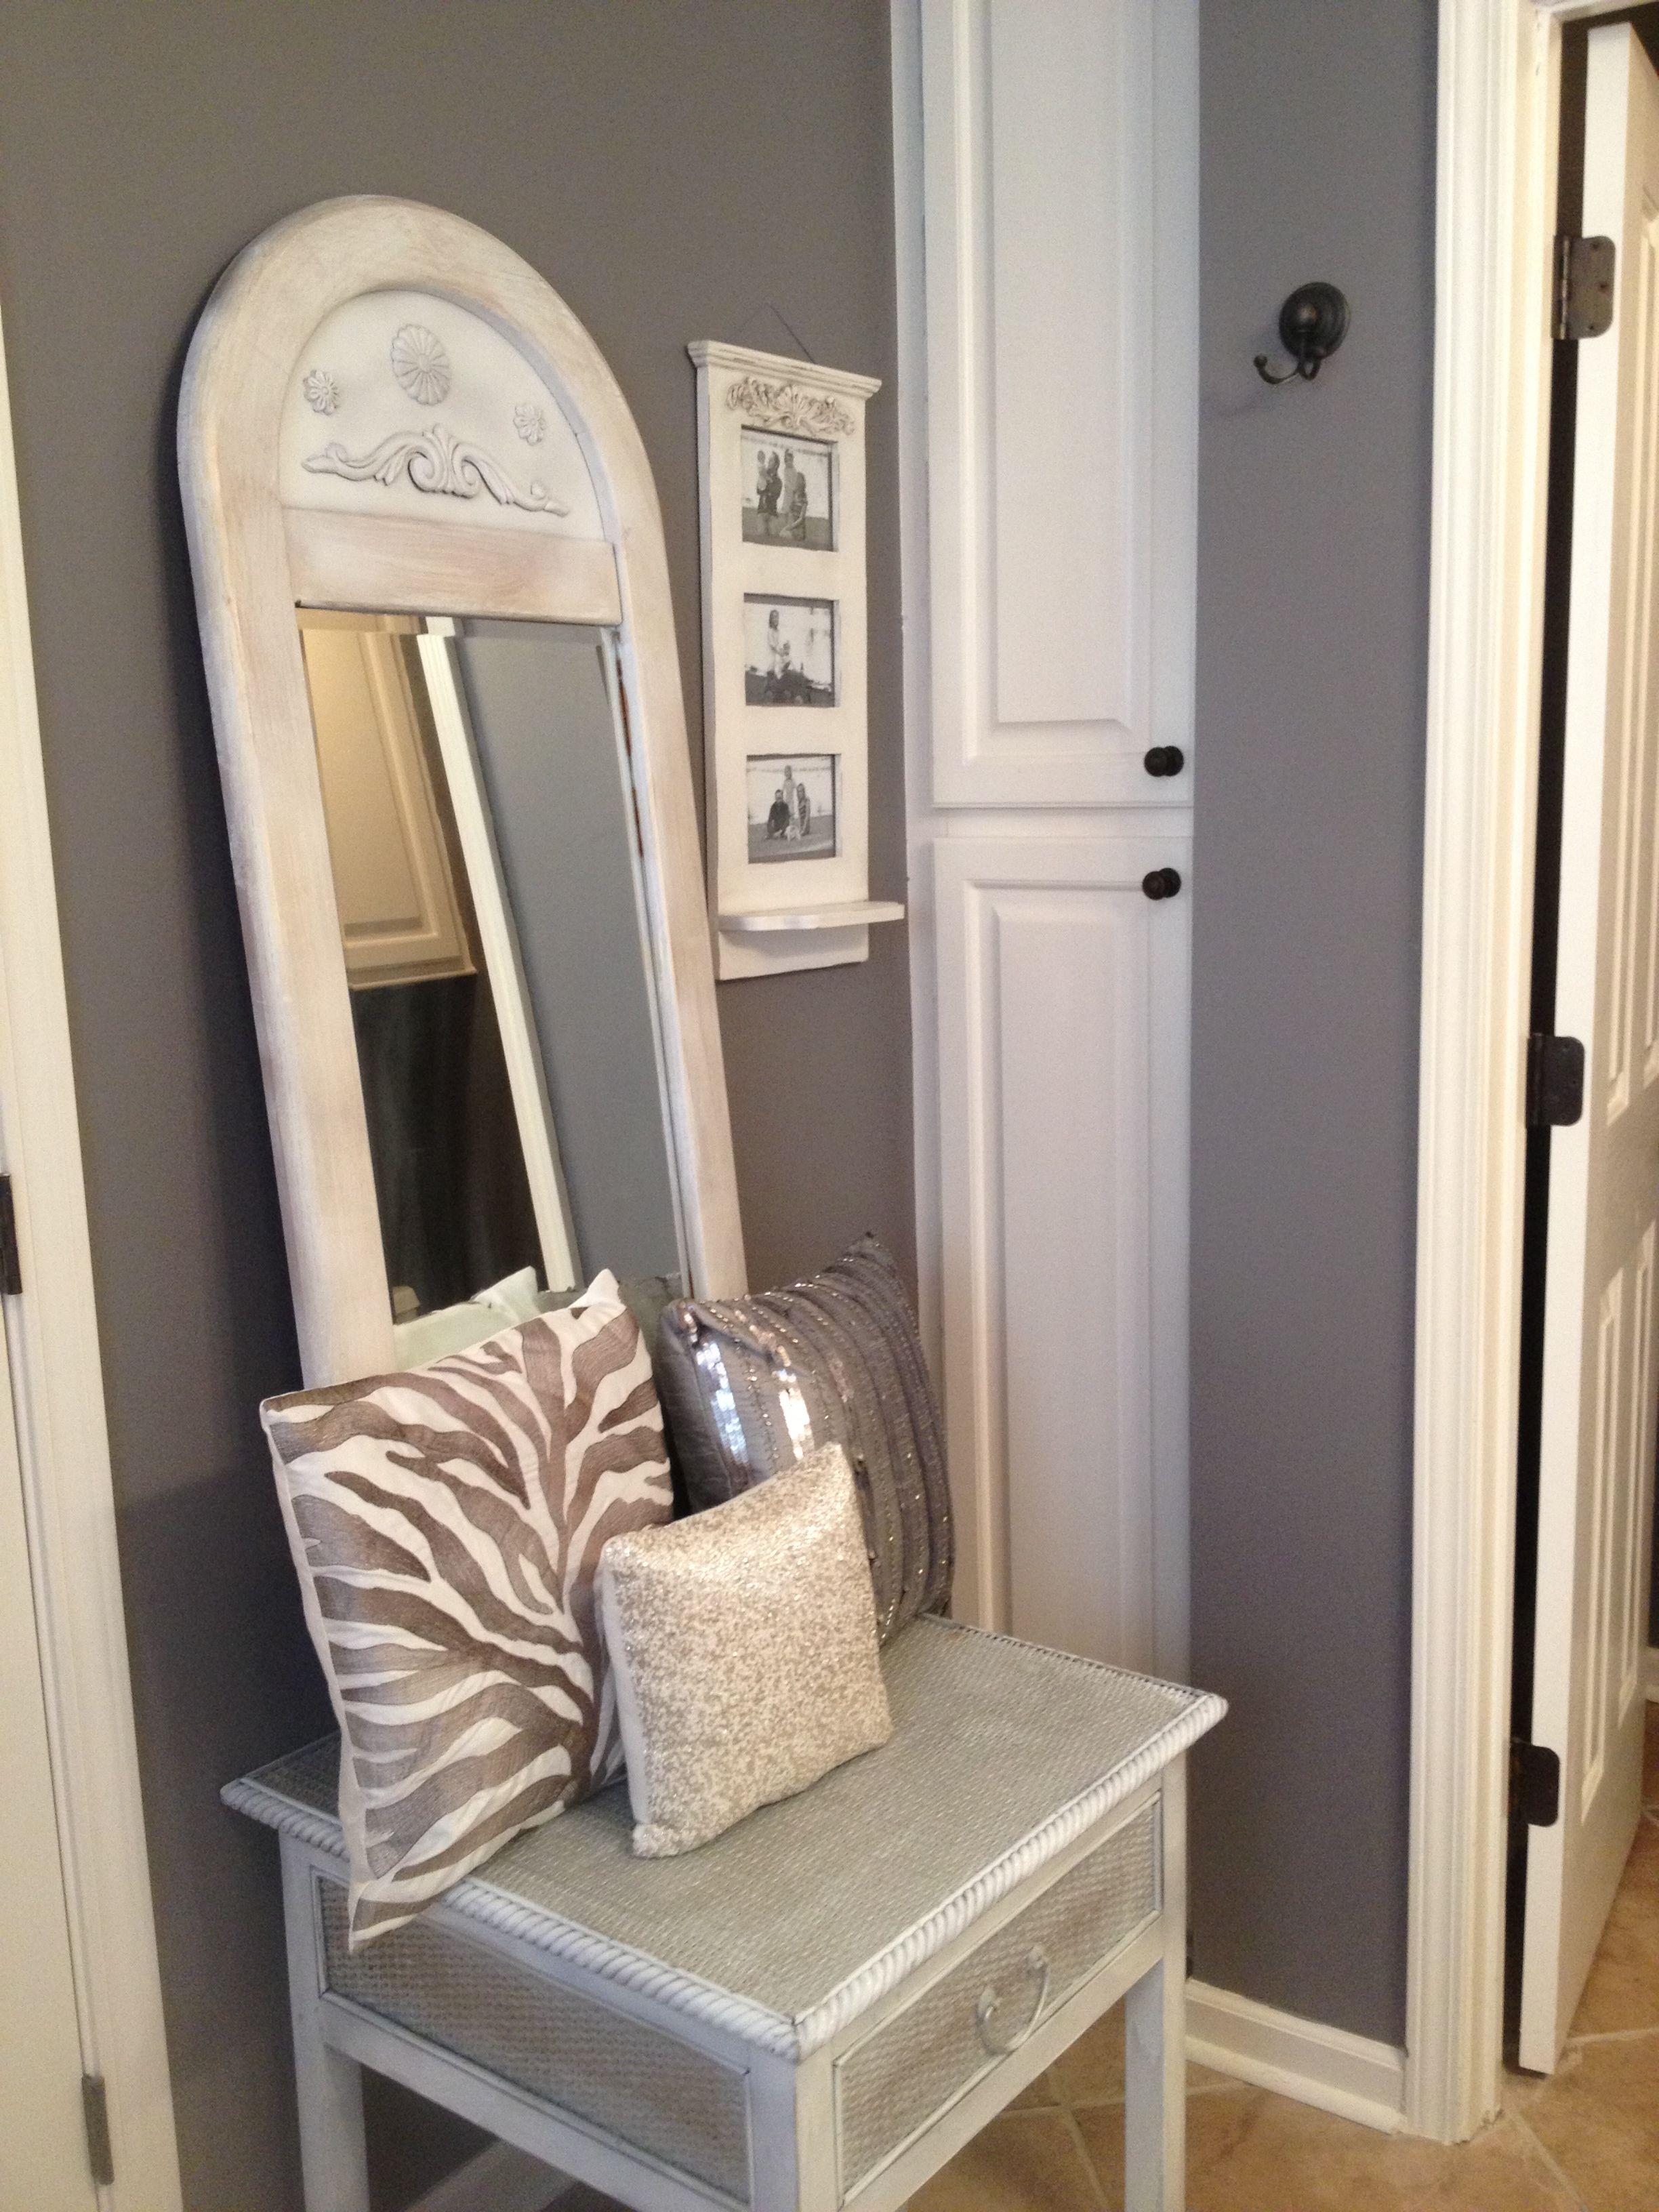 Grey Decor Bathroom: Silver, White And Gray Bathroom Decor